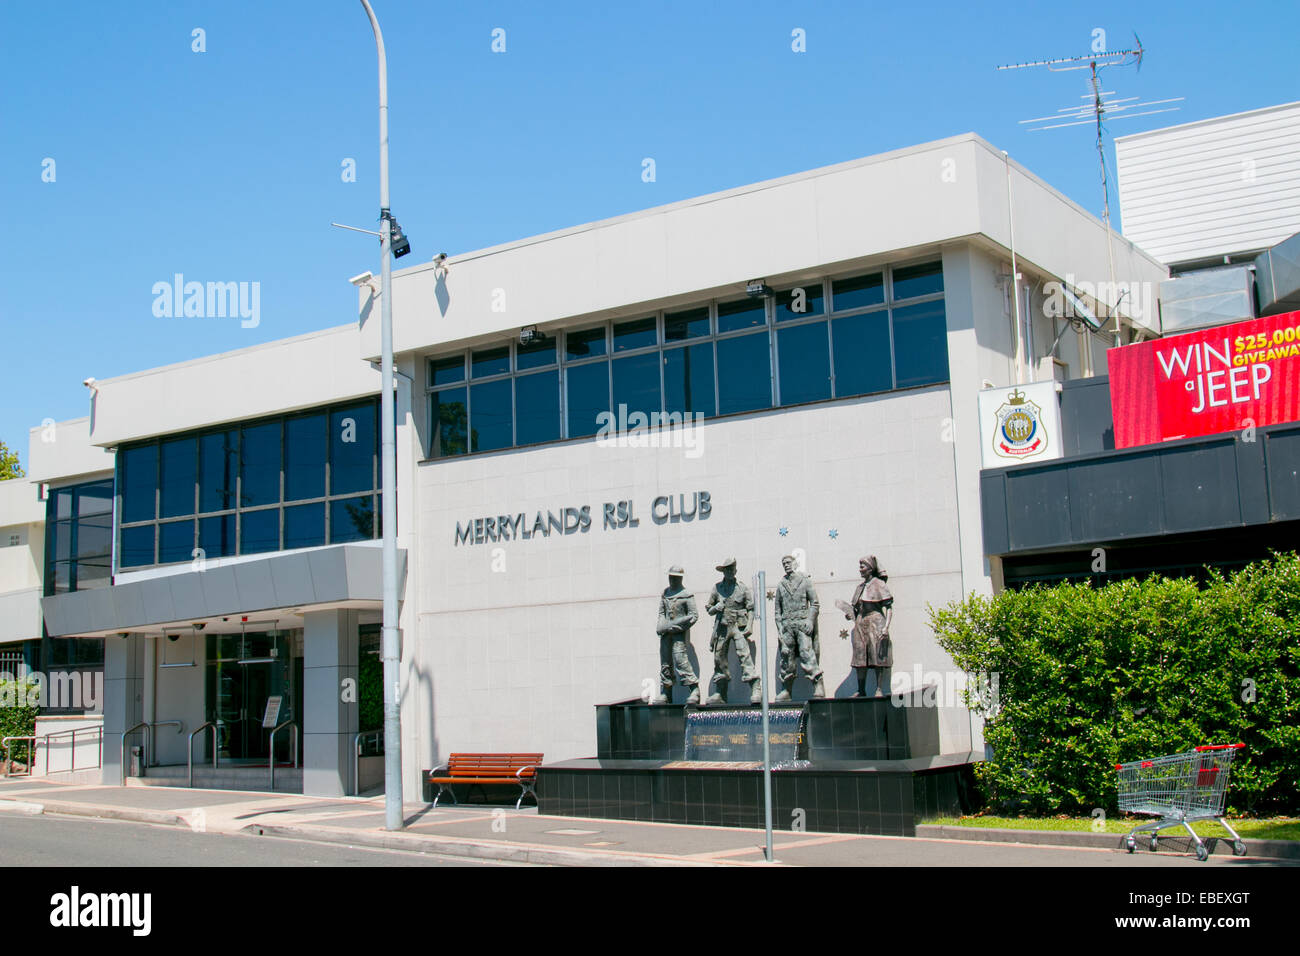 Merrylands RSL club in western sydney,australia - Stock Image